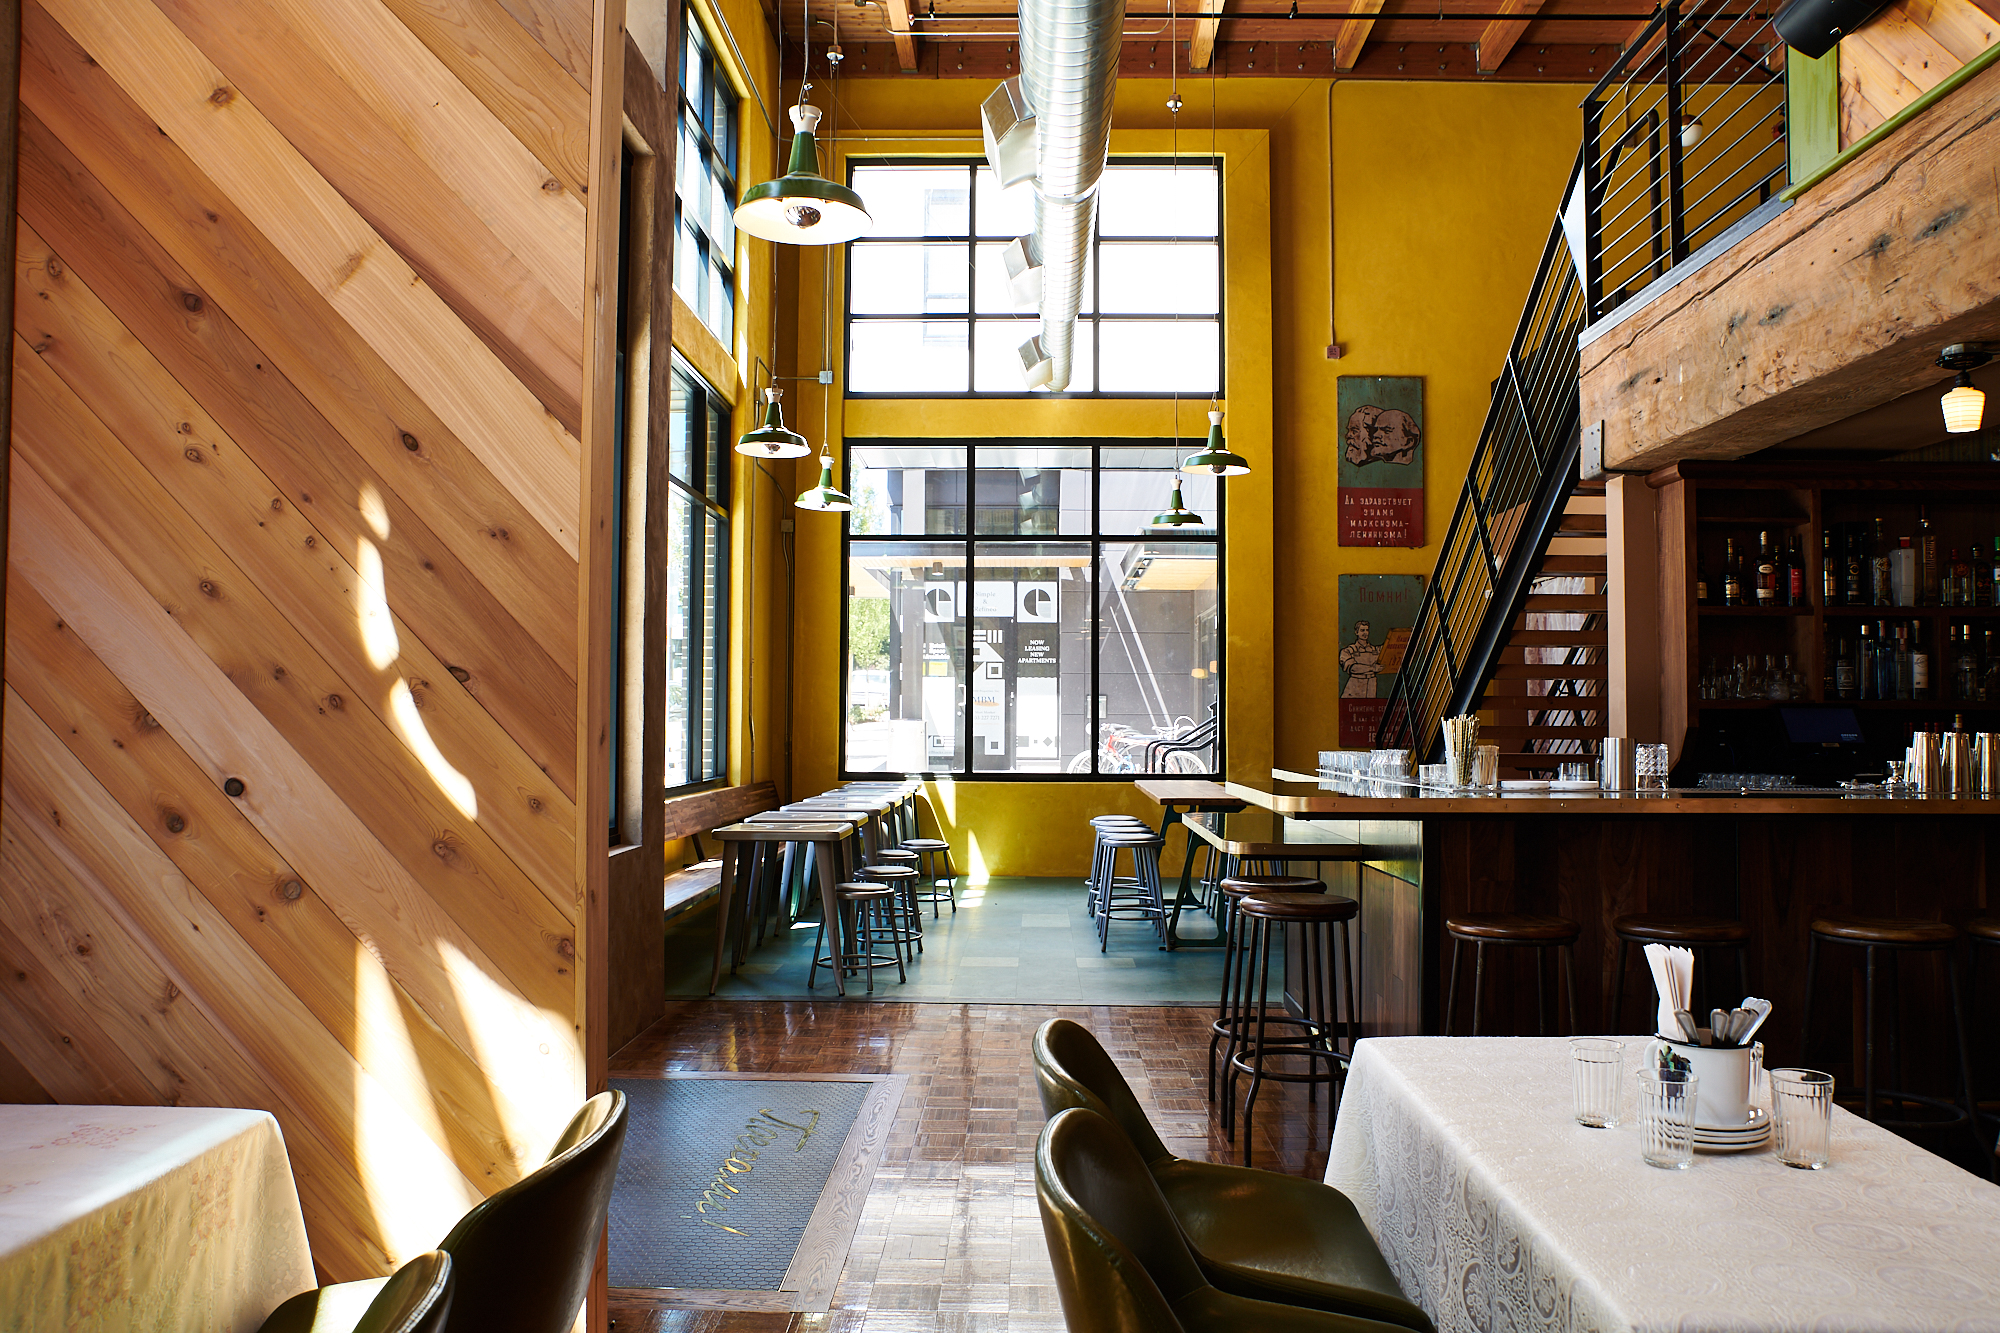 The sprawling dining room at Kachka